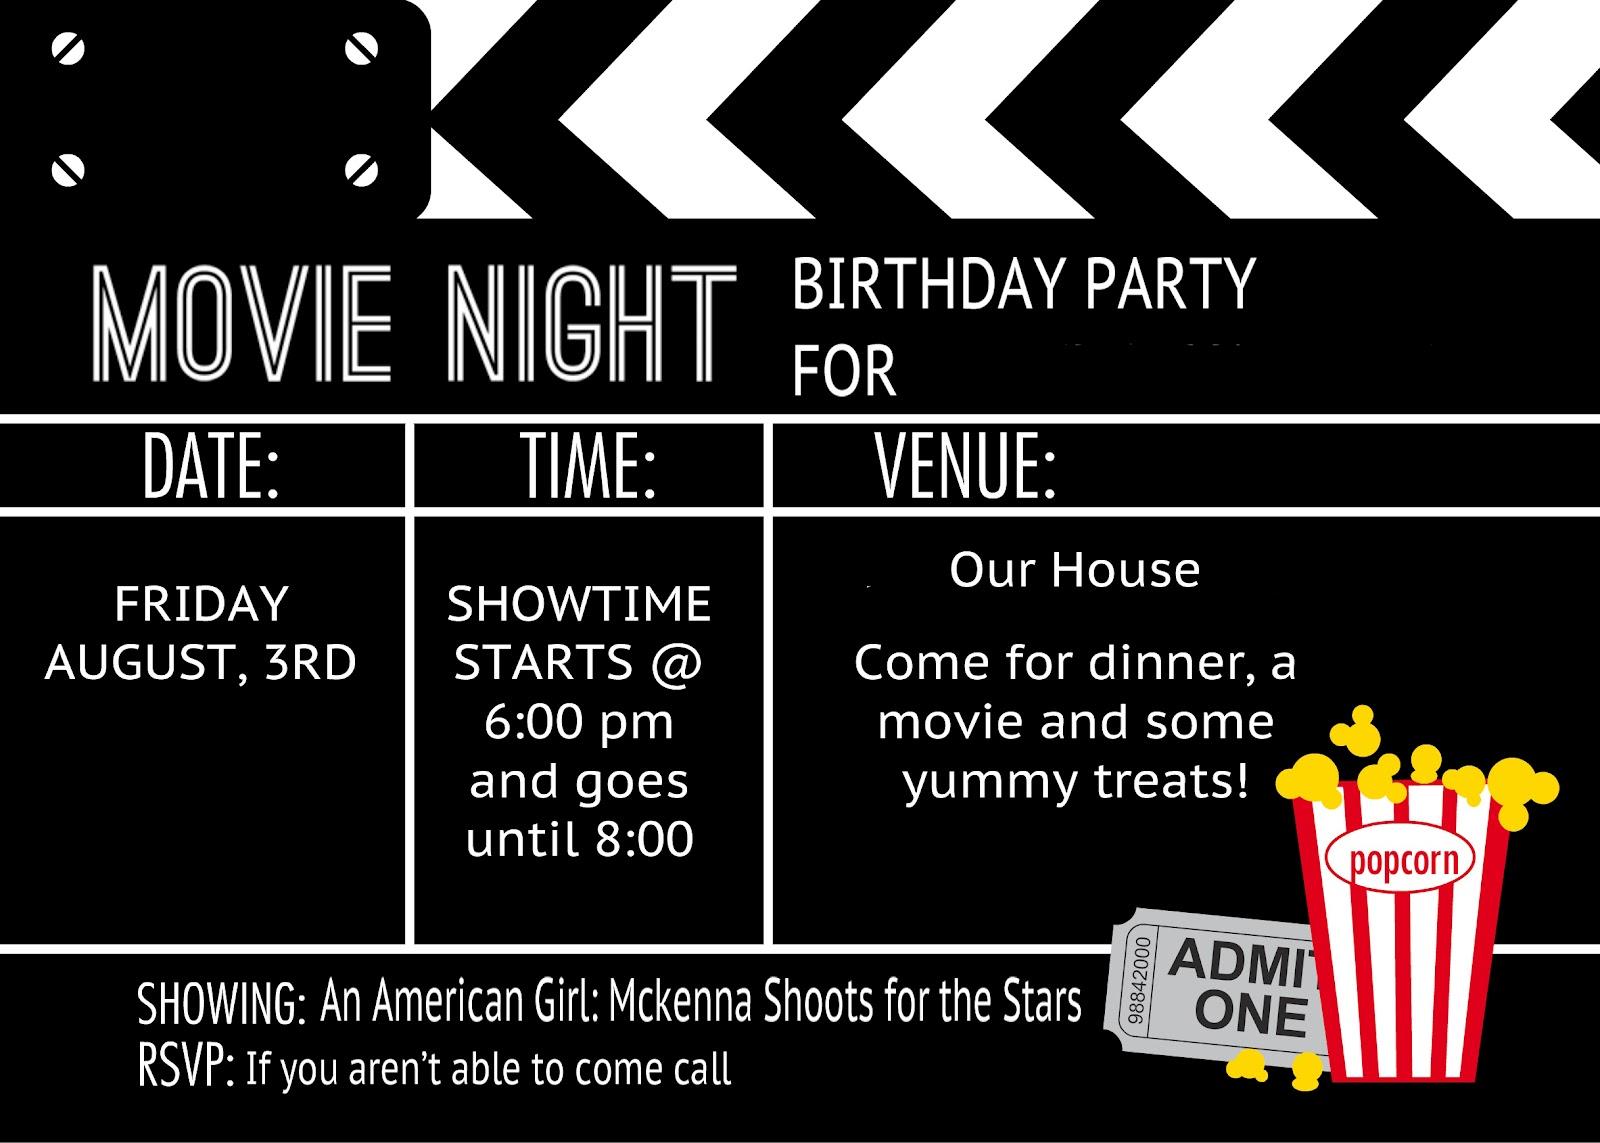 Movie Night Invitations Template movie ticket invitation template – Movie Ticket Invitations Printable Free